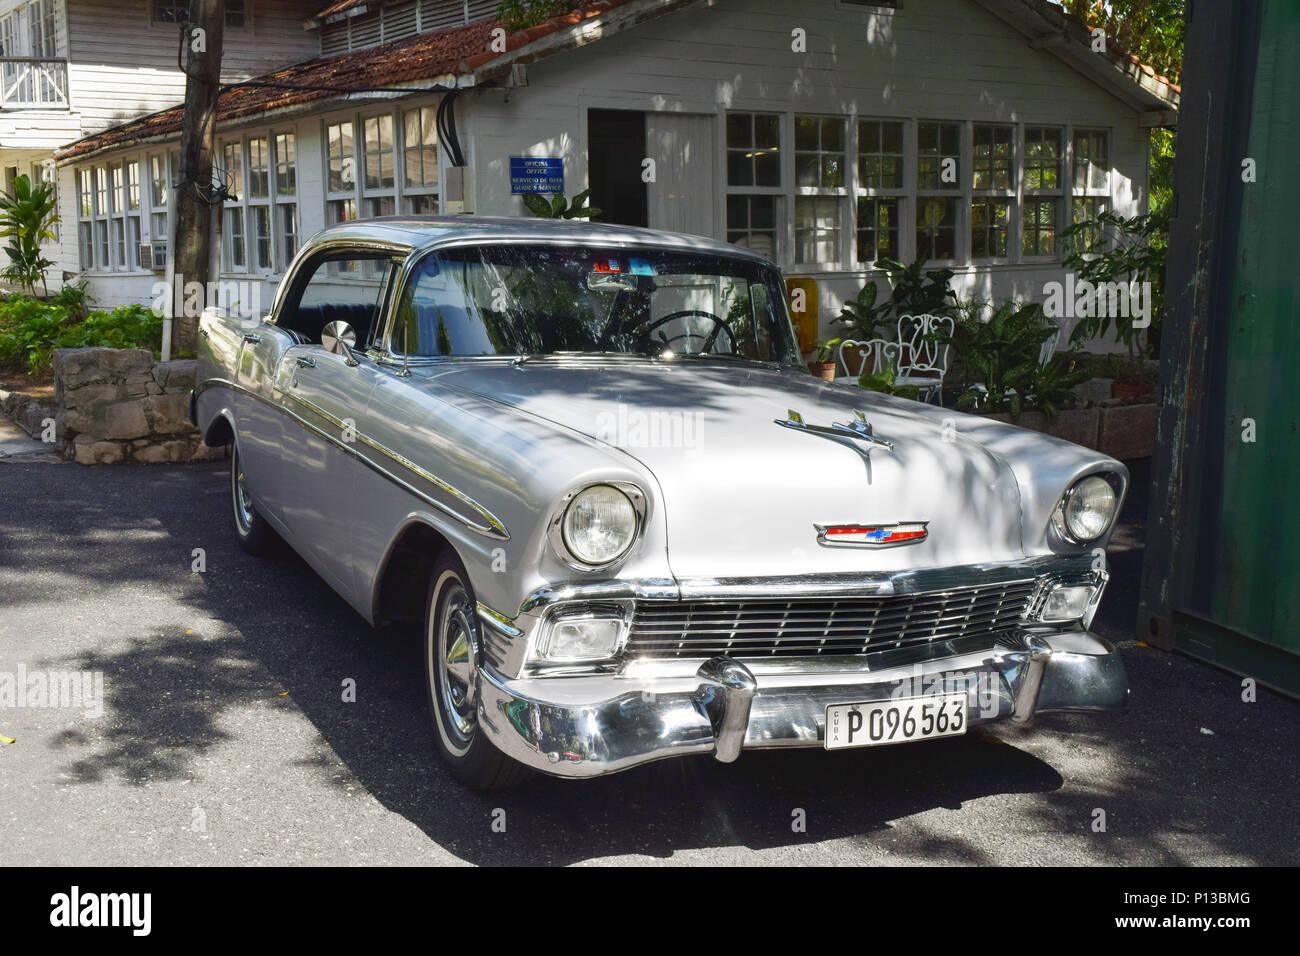 SAN FRANCISCO DE PAULA, CUBA - JUNE 10th, 2016: Ernest Hemingway's Chevrolet car at his house Finca Vigia, near Havana, Cuba. It is now a museum.  Mos Stock Photo